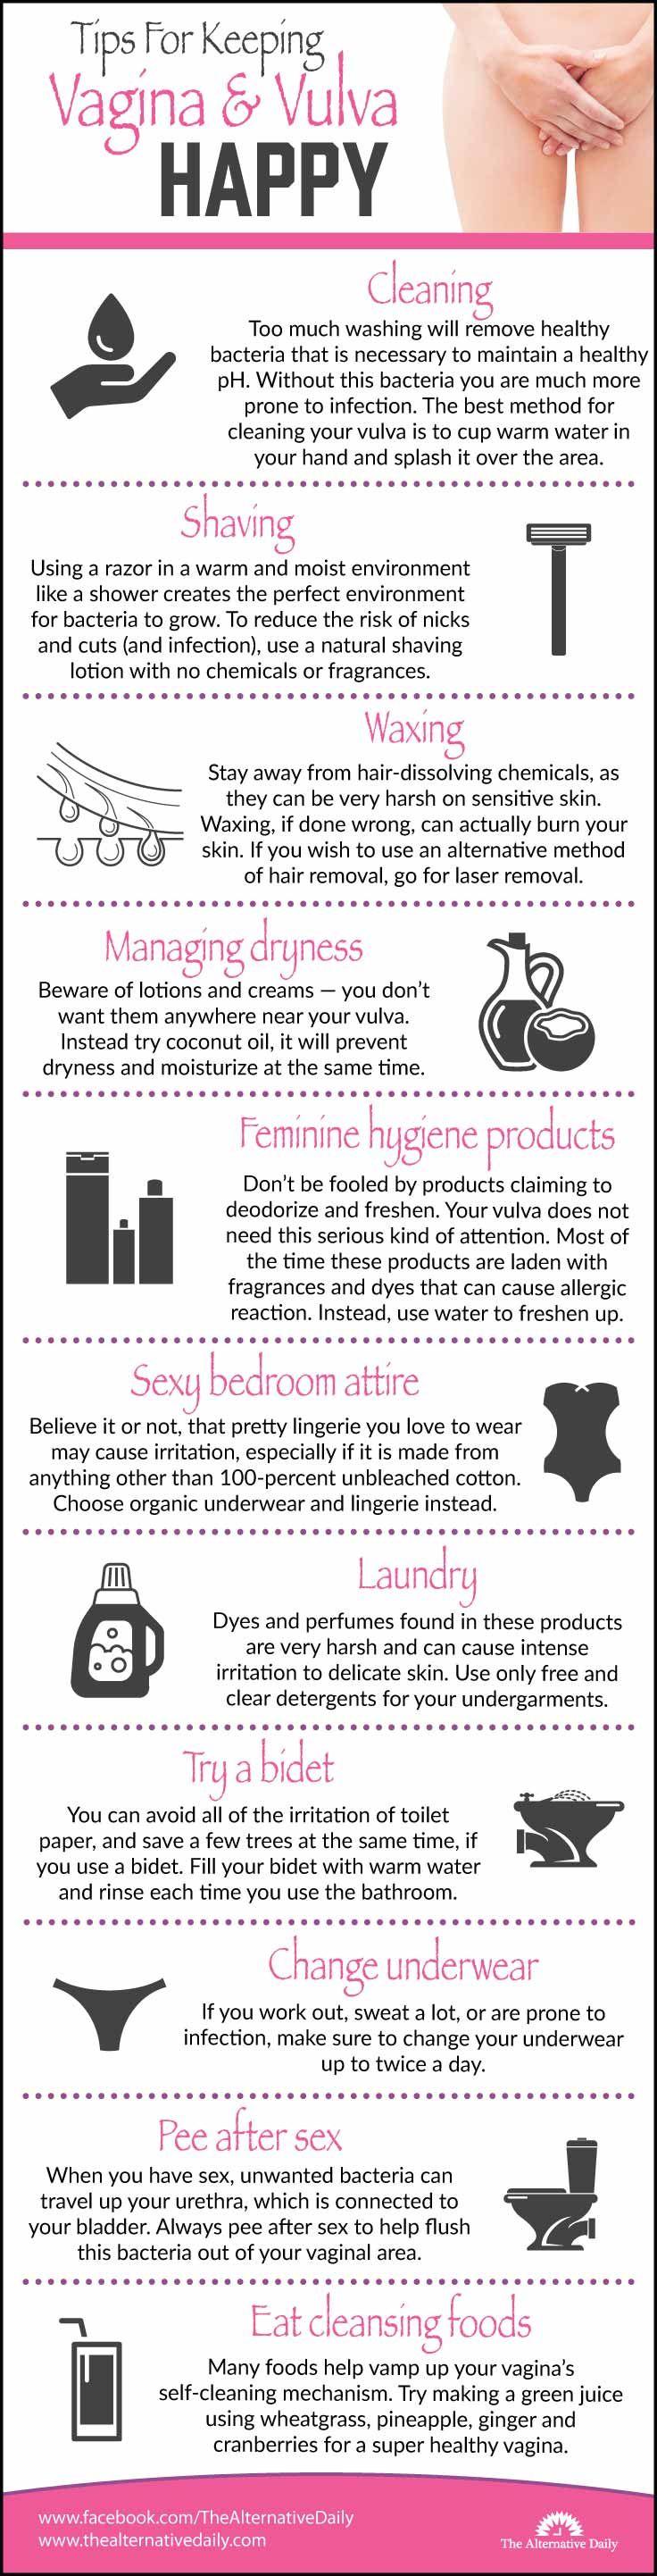 tips-for-keeping-vagina-and-vulva-happy